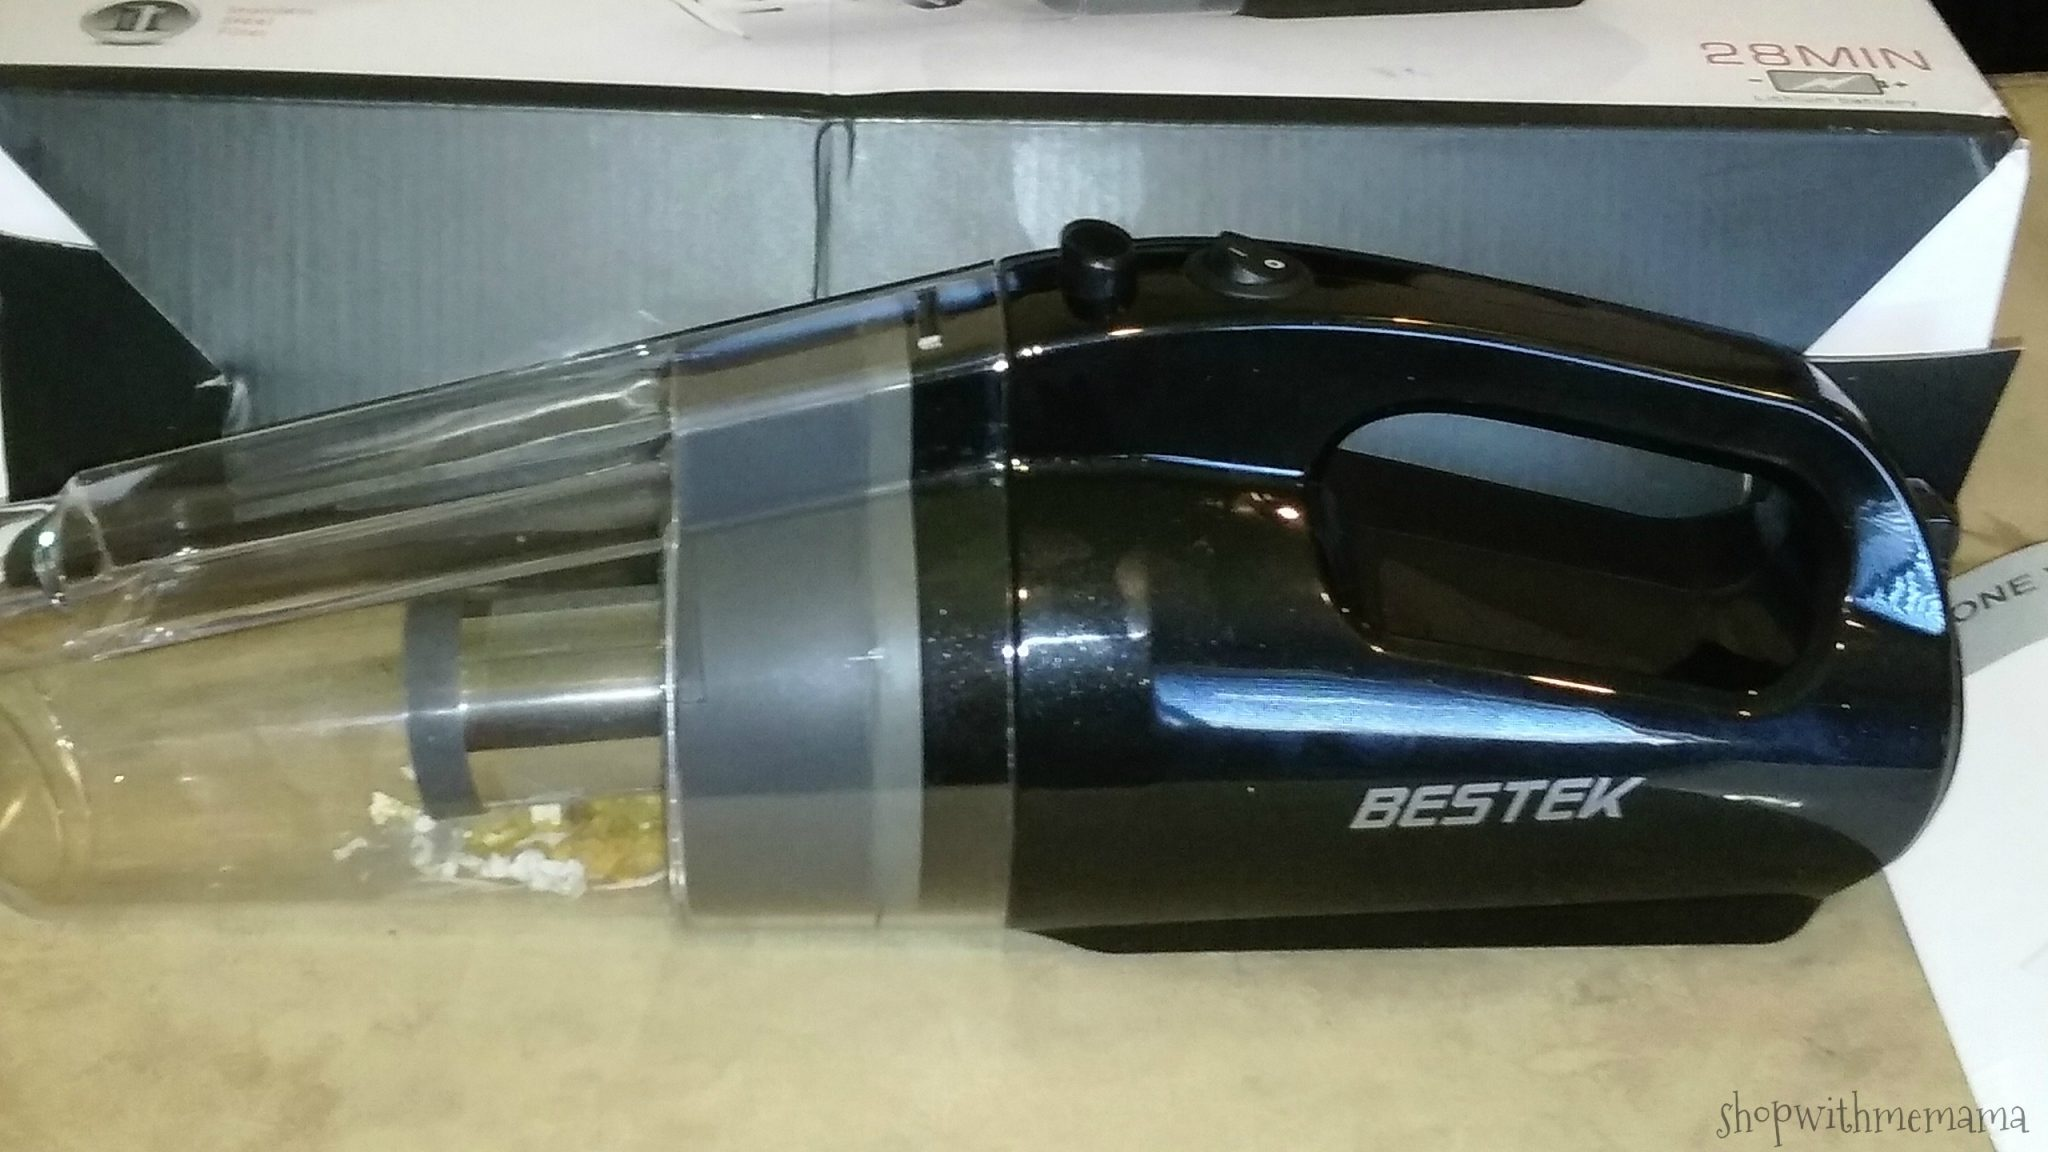 Get Your Home Clean With BESTEK Cordless Handheld Vacuum